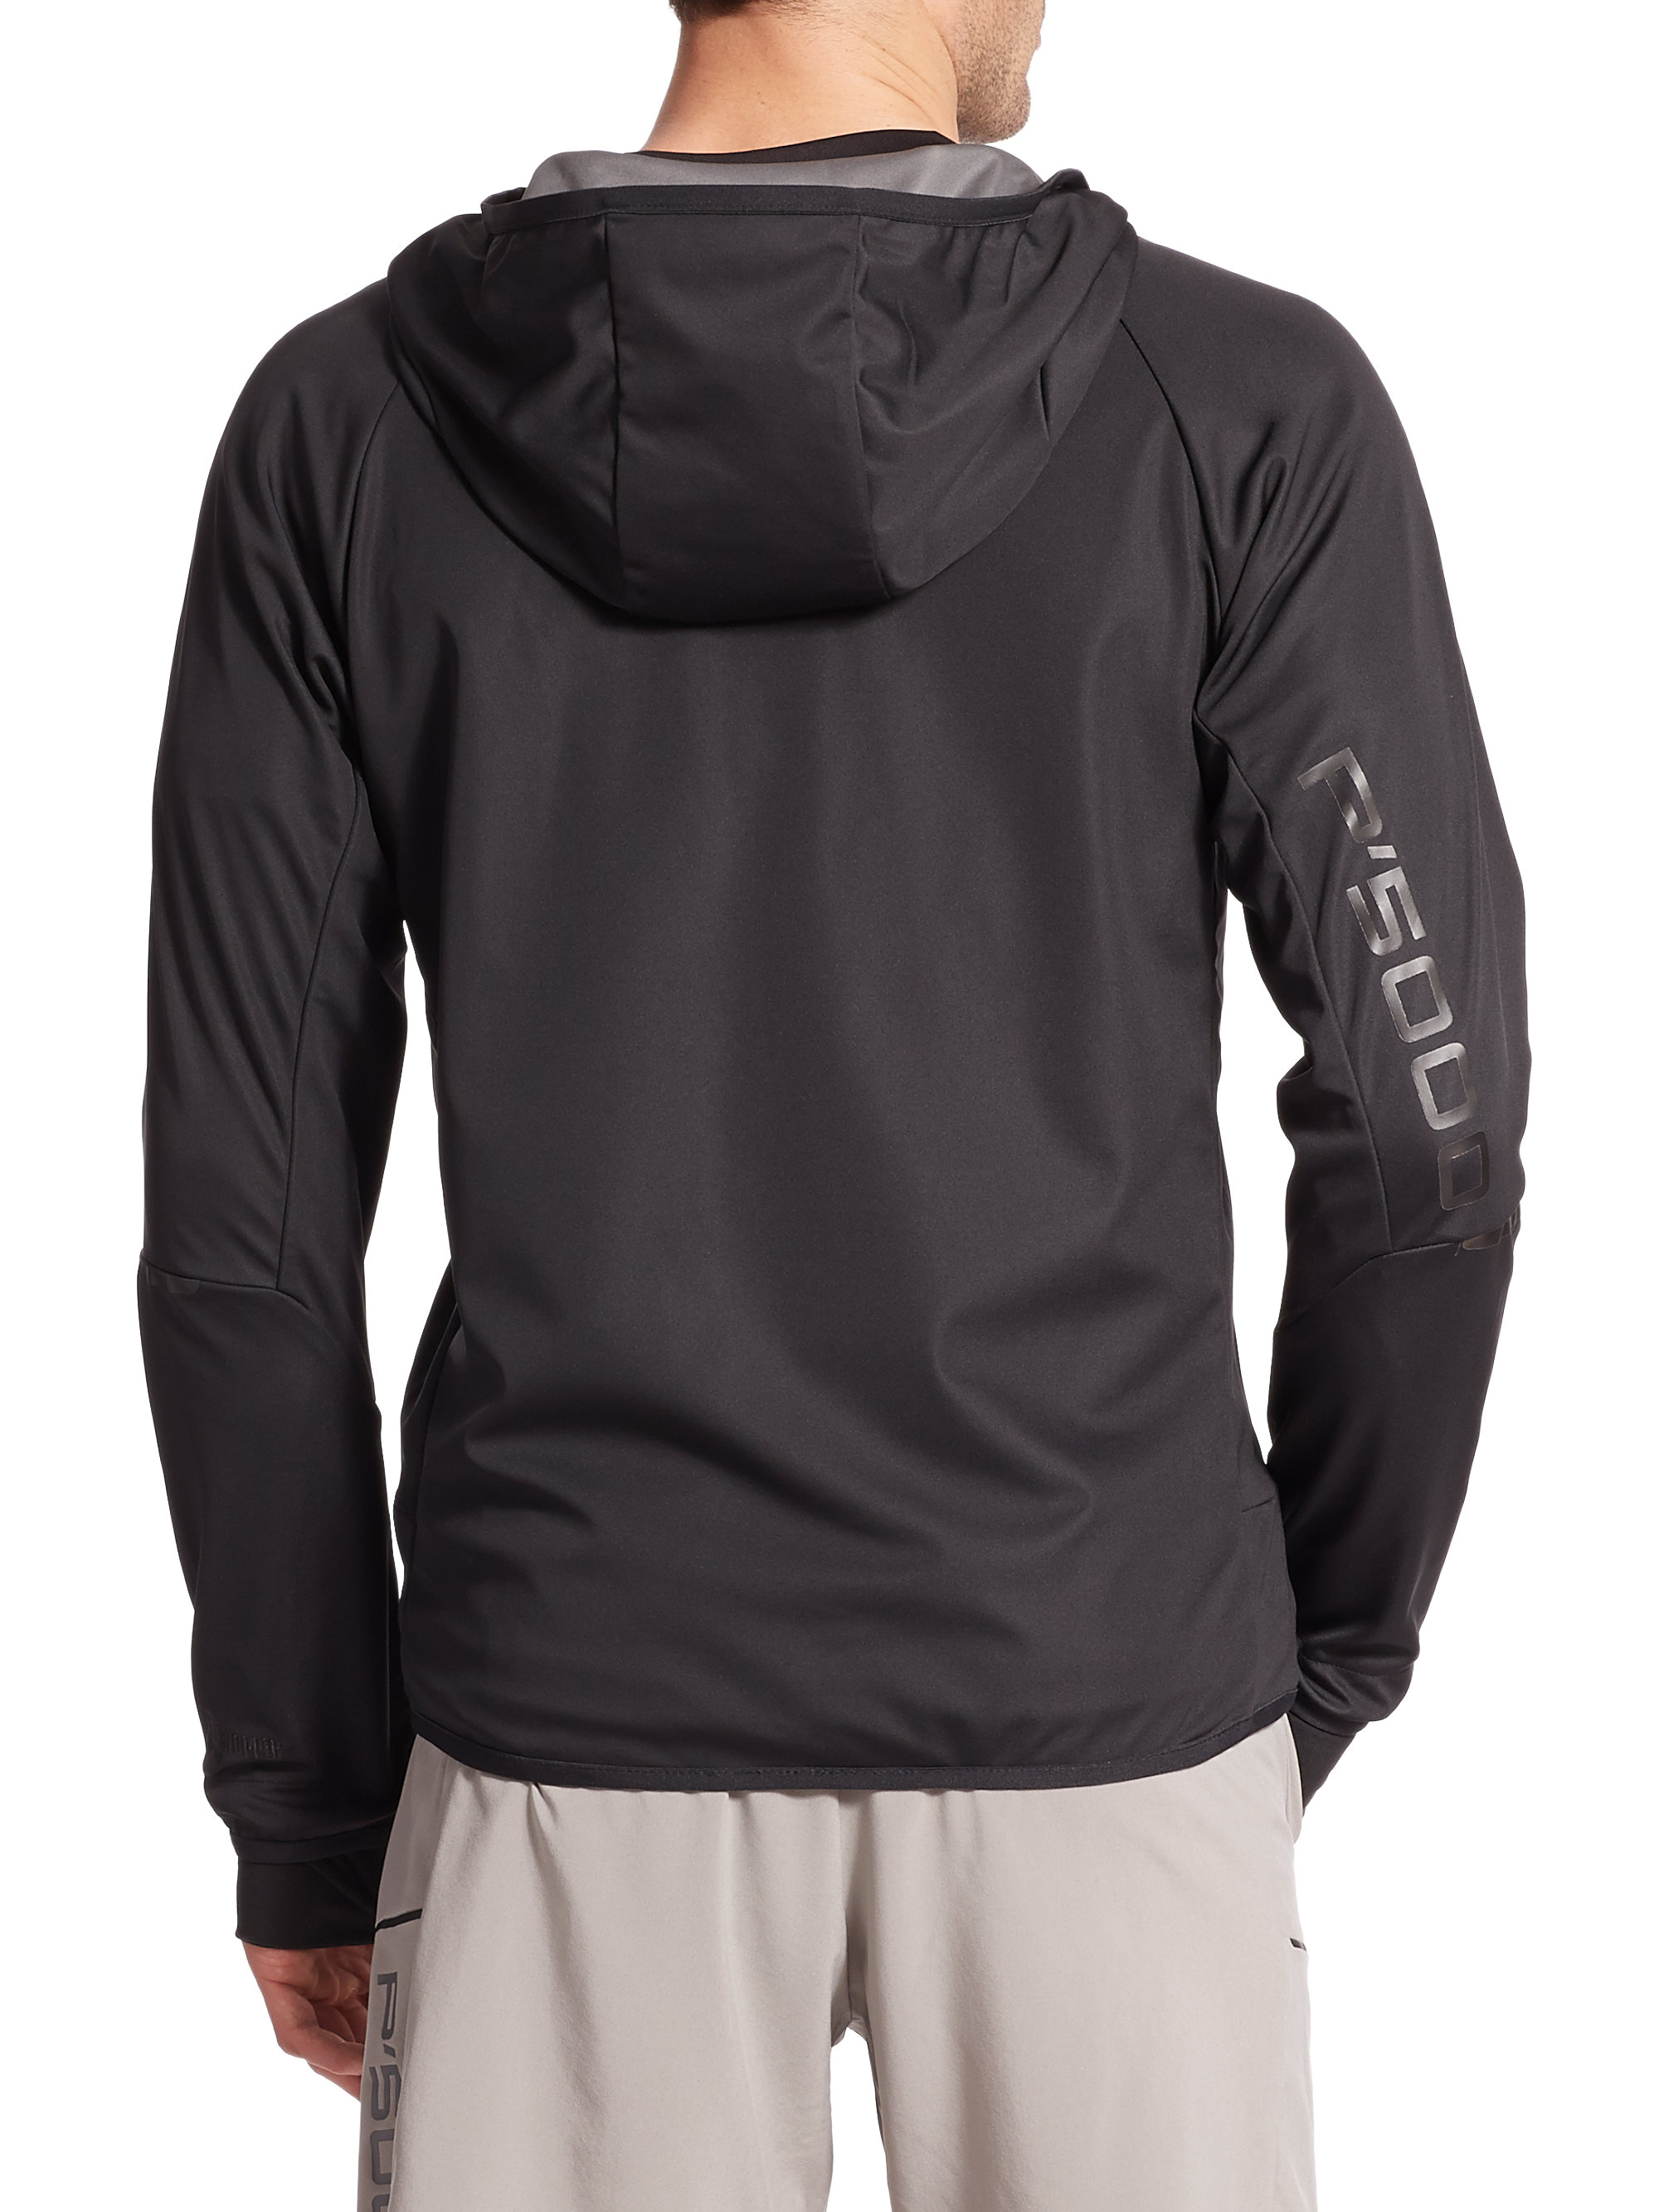 Shirt jacket design - Gallery